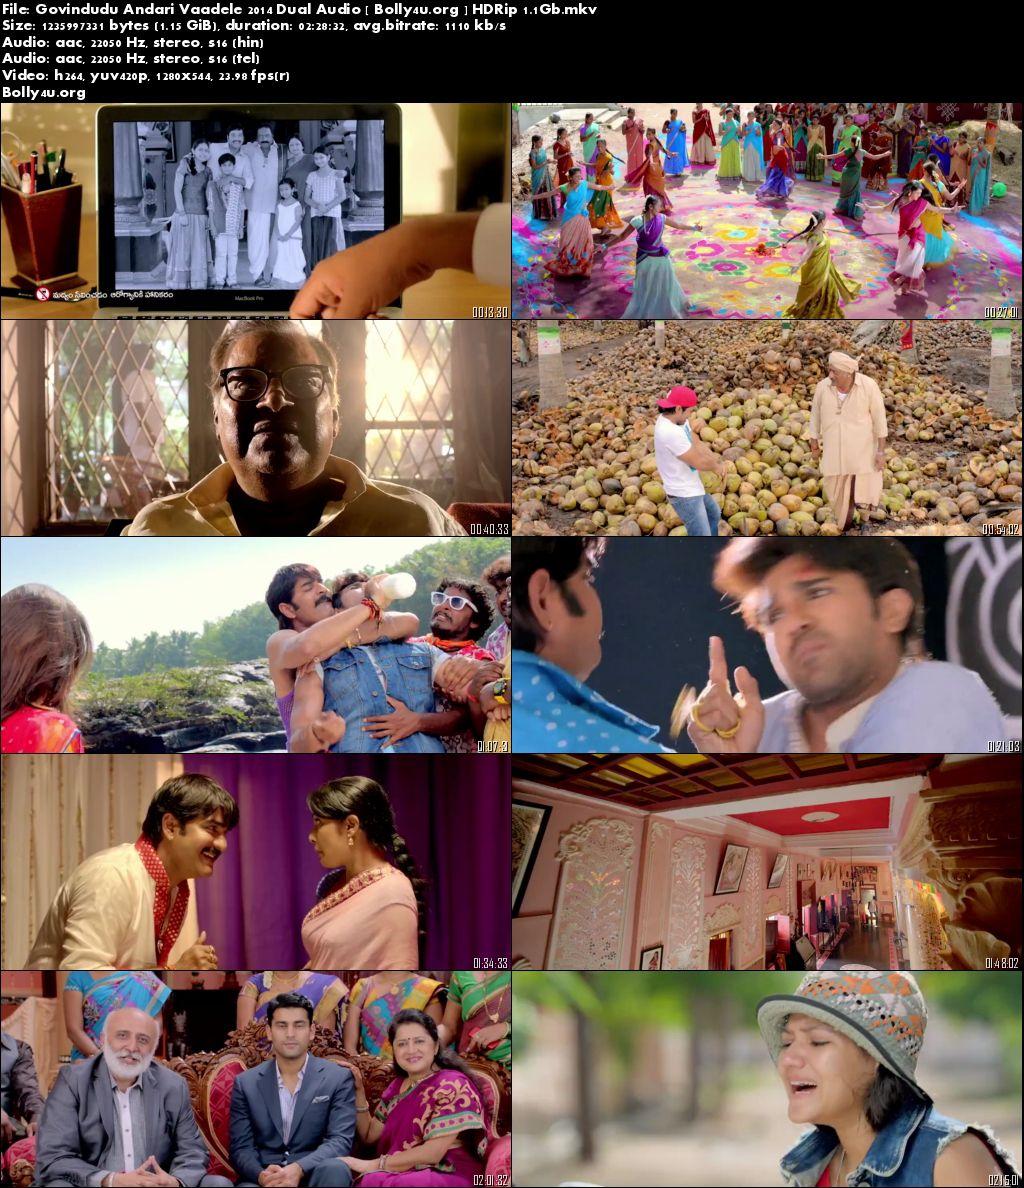 Govindudu Andari Vaadele 2014 HDRip 1.1Gb 720p Hindi Dual Audio Worldfree4u